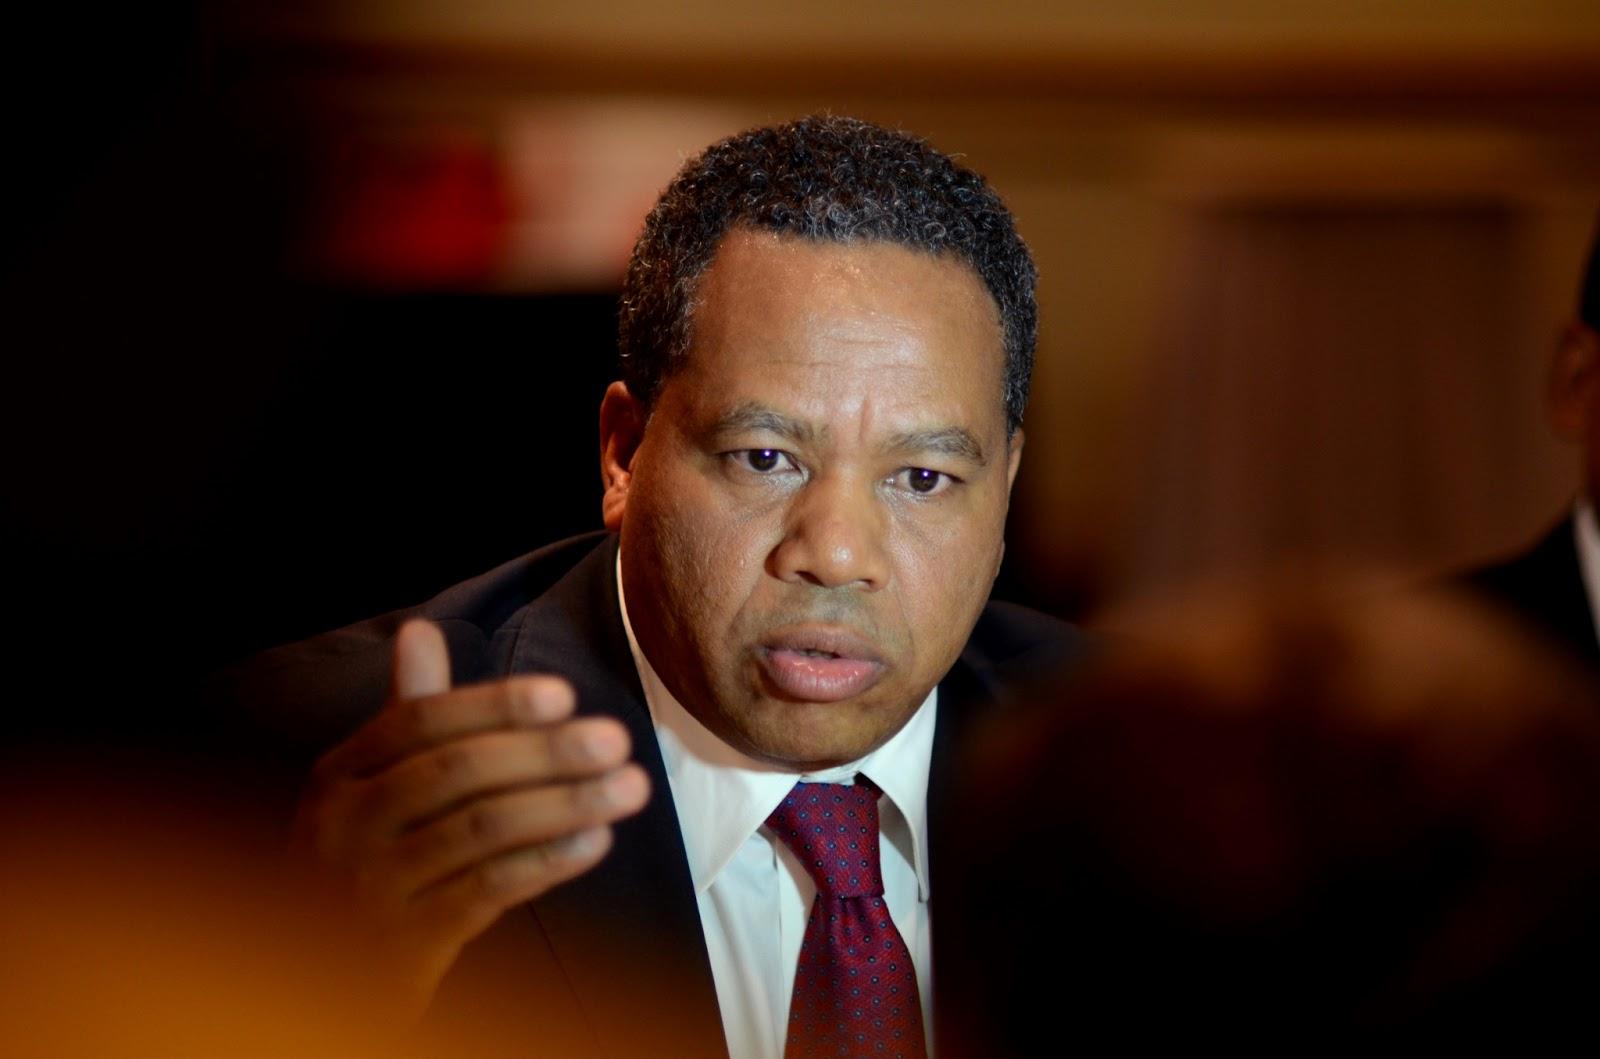 wHO's who? l'élection présidentielle à Madagascar en 18 photos  MADA+ROLAND+RATSIRAKA+1+CLR